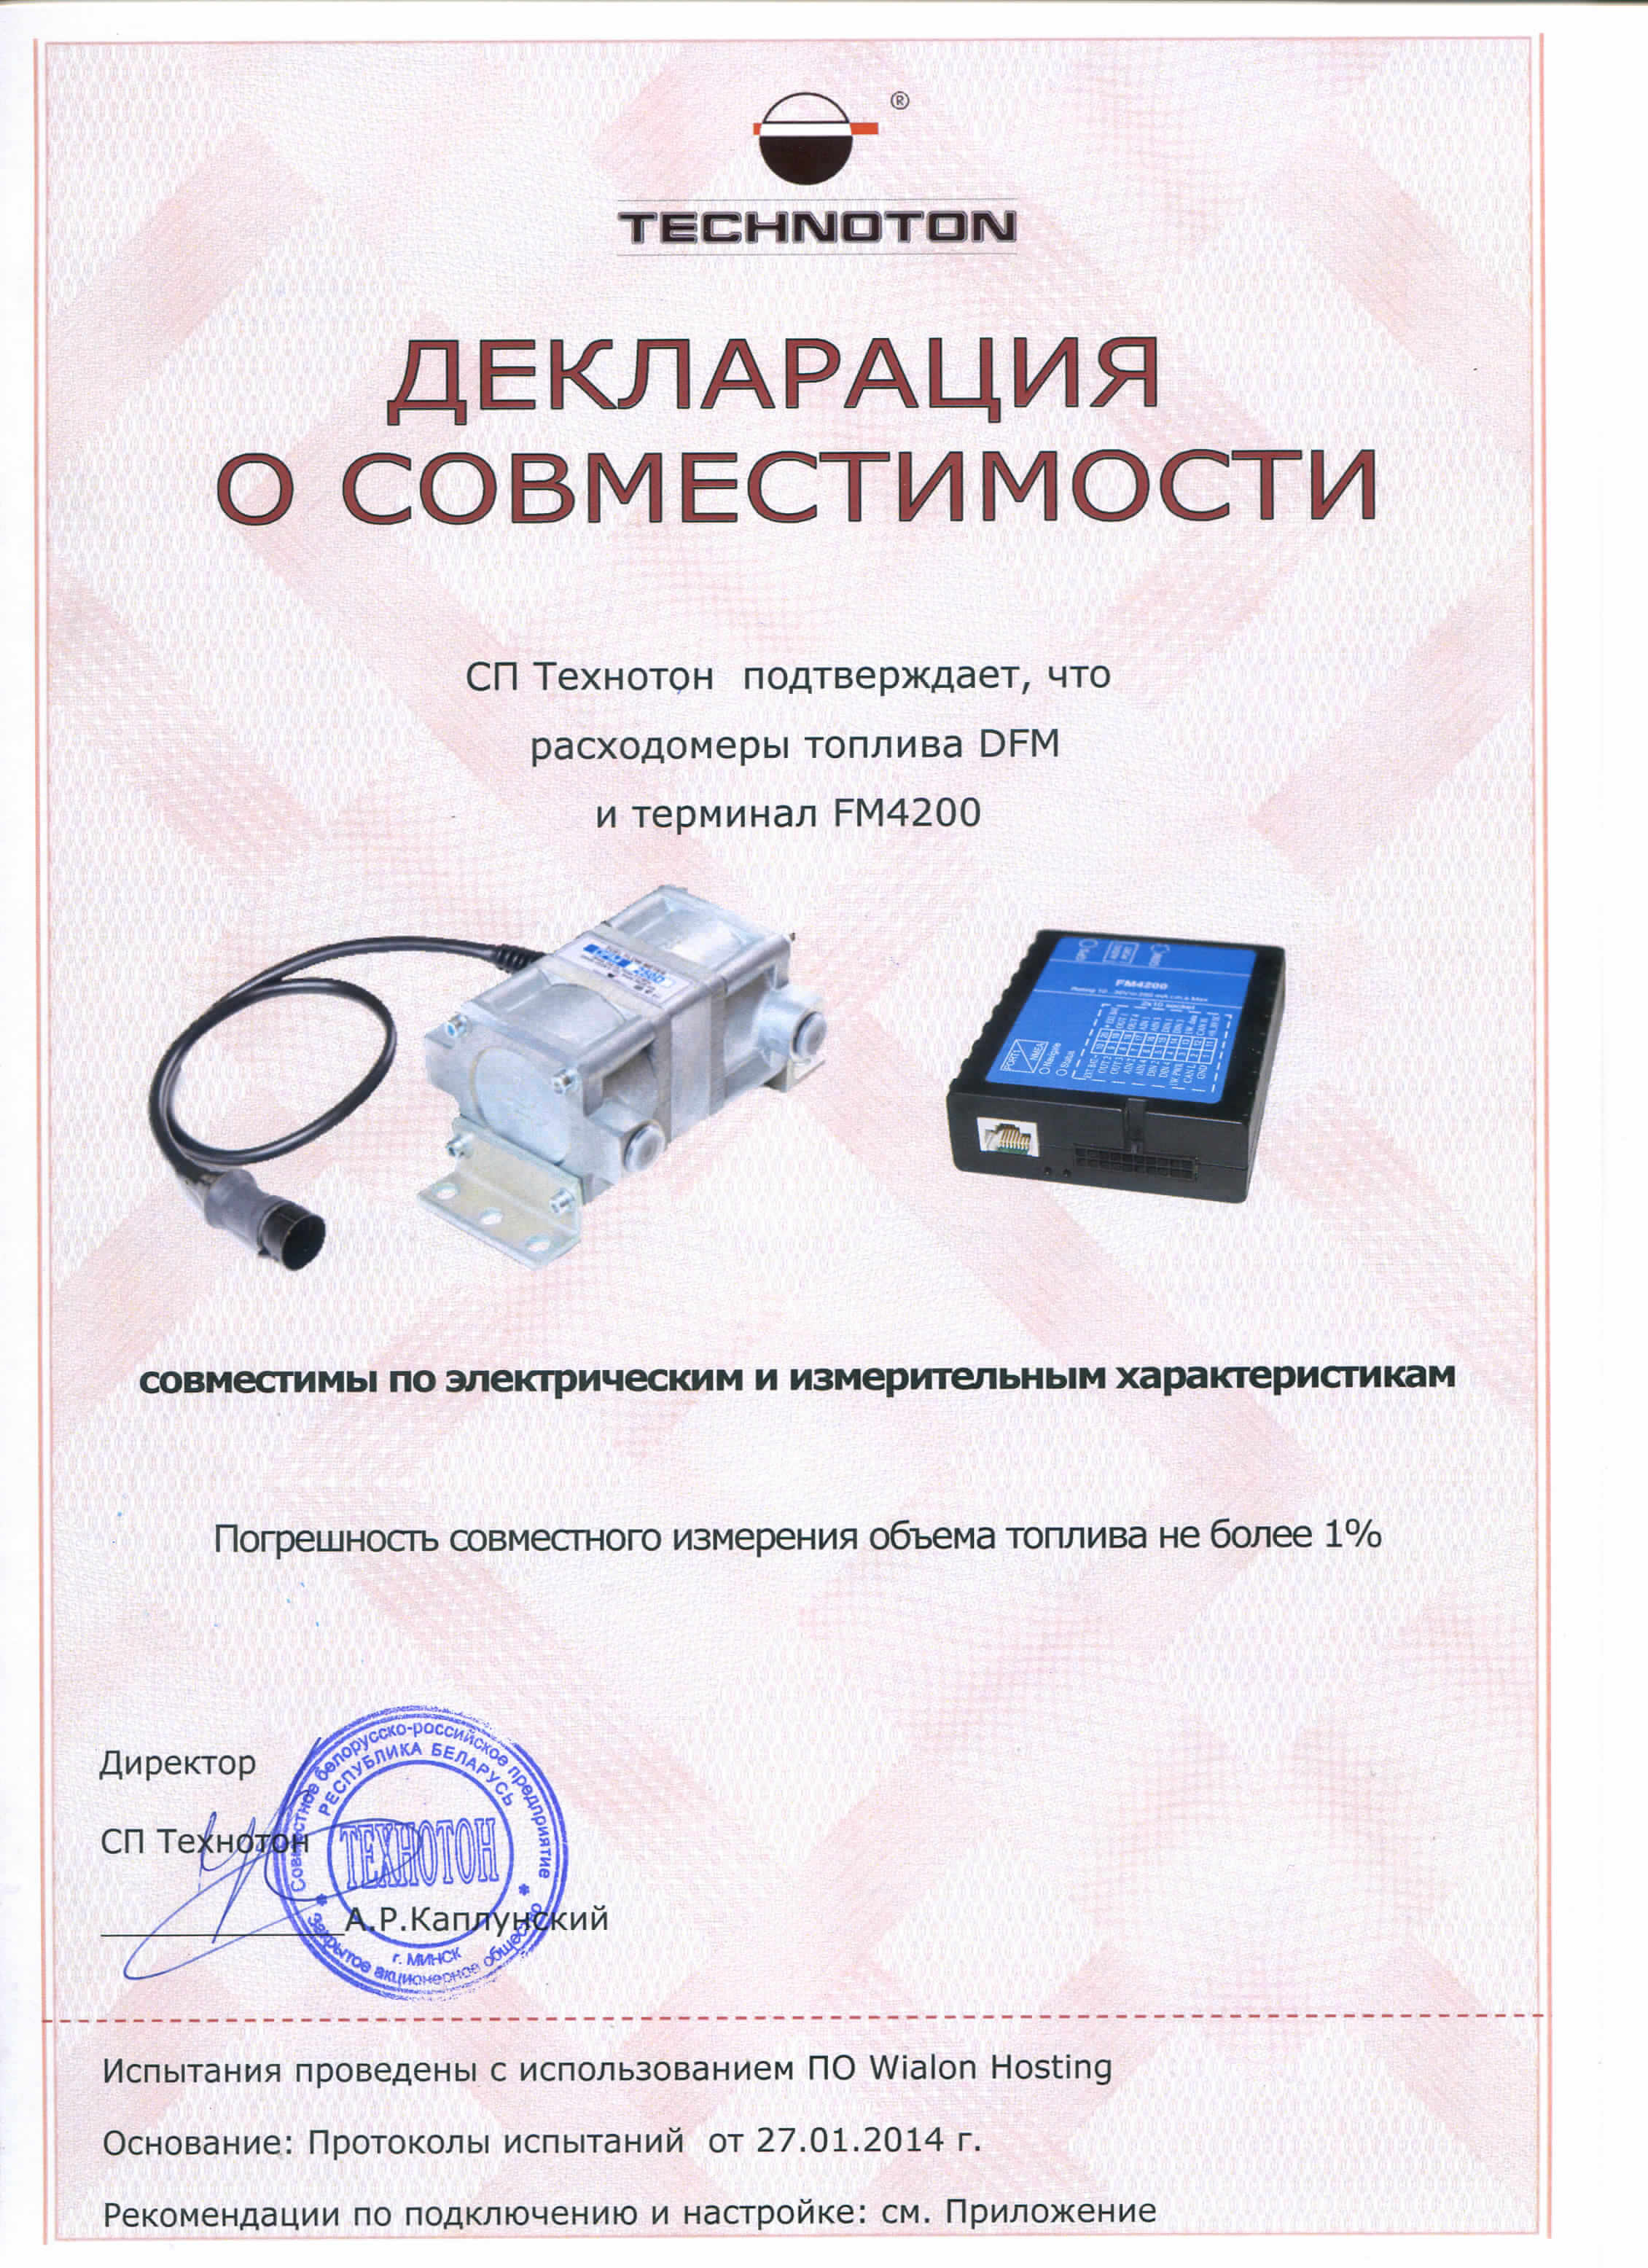 DFM DK совместим с Teltonica FM4200